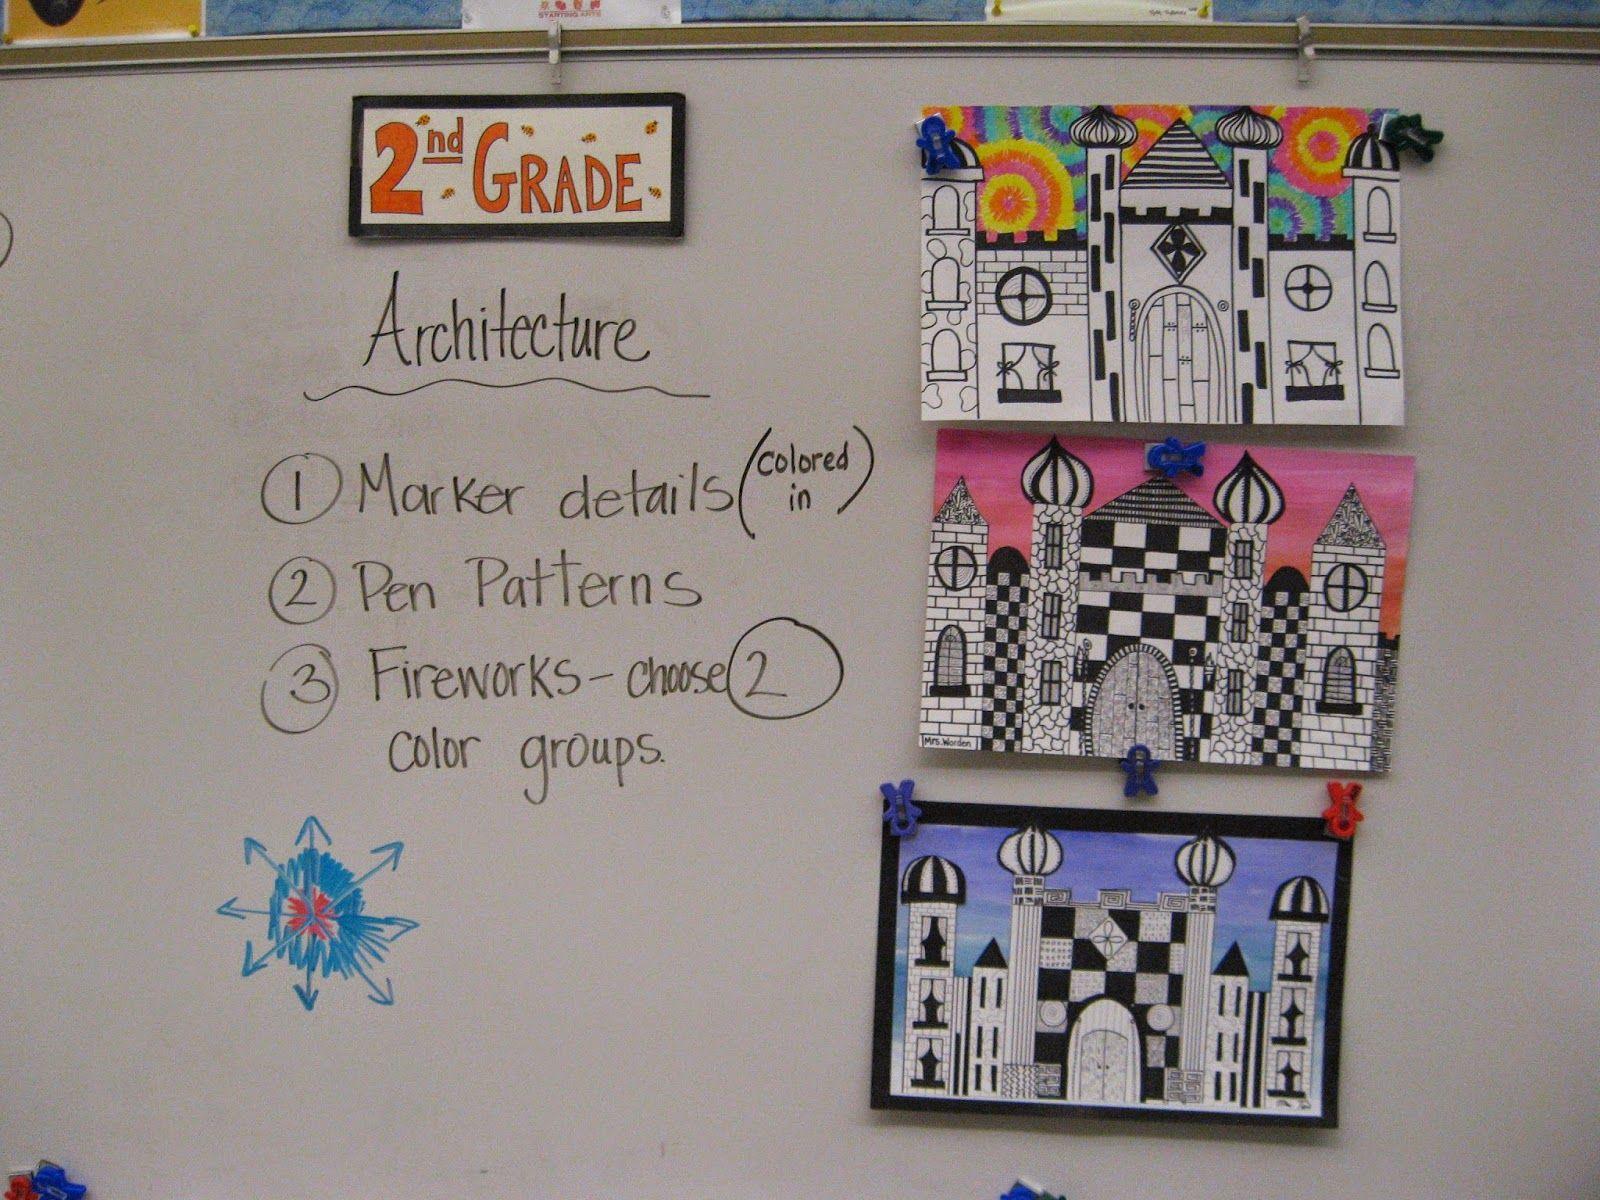 2nd Grade Castle Architecture Jamestown Elementary Art Blog